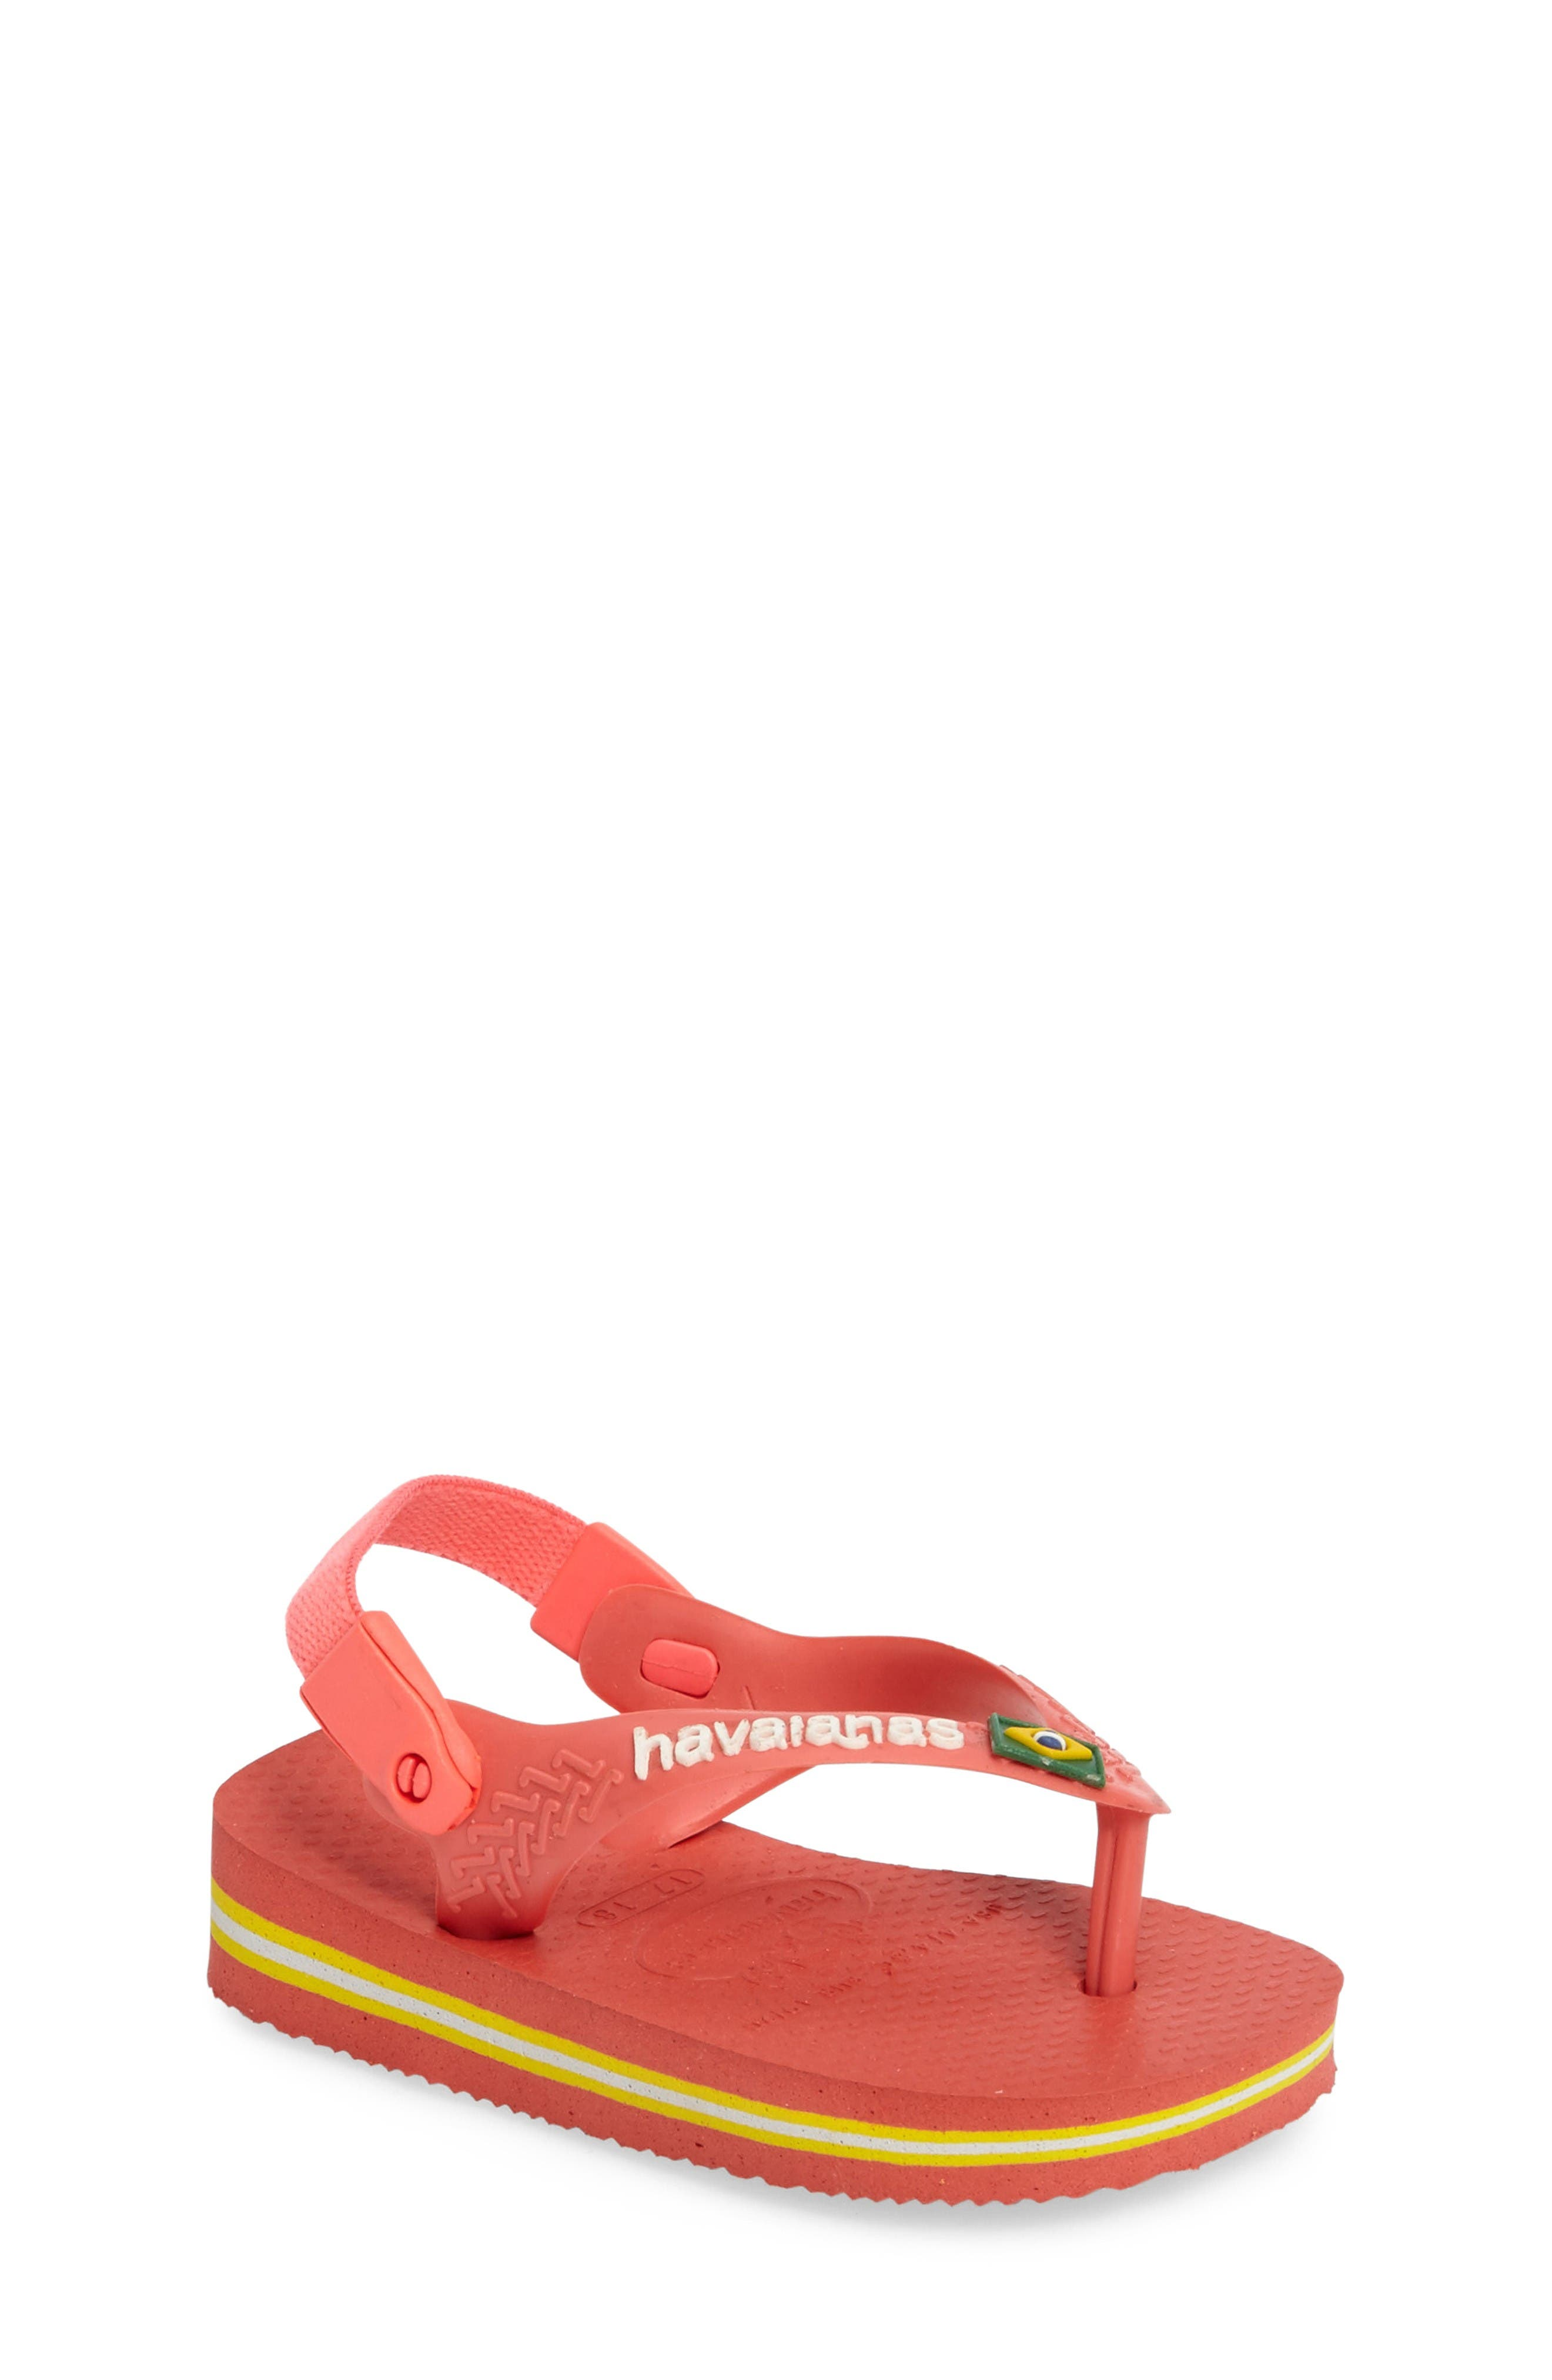 HAVAIANAS 'Baby Brazil' Sandal